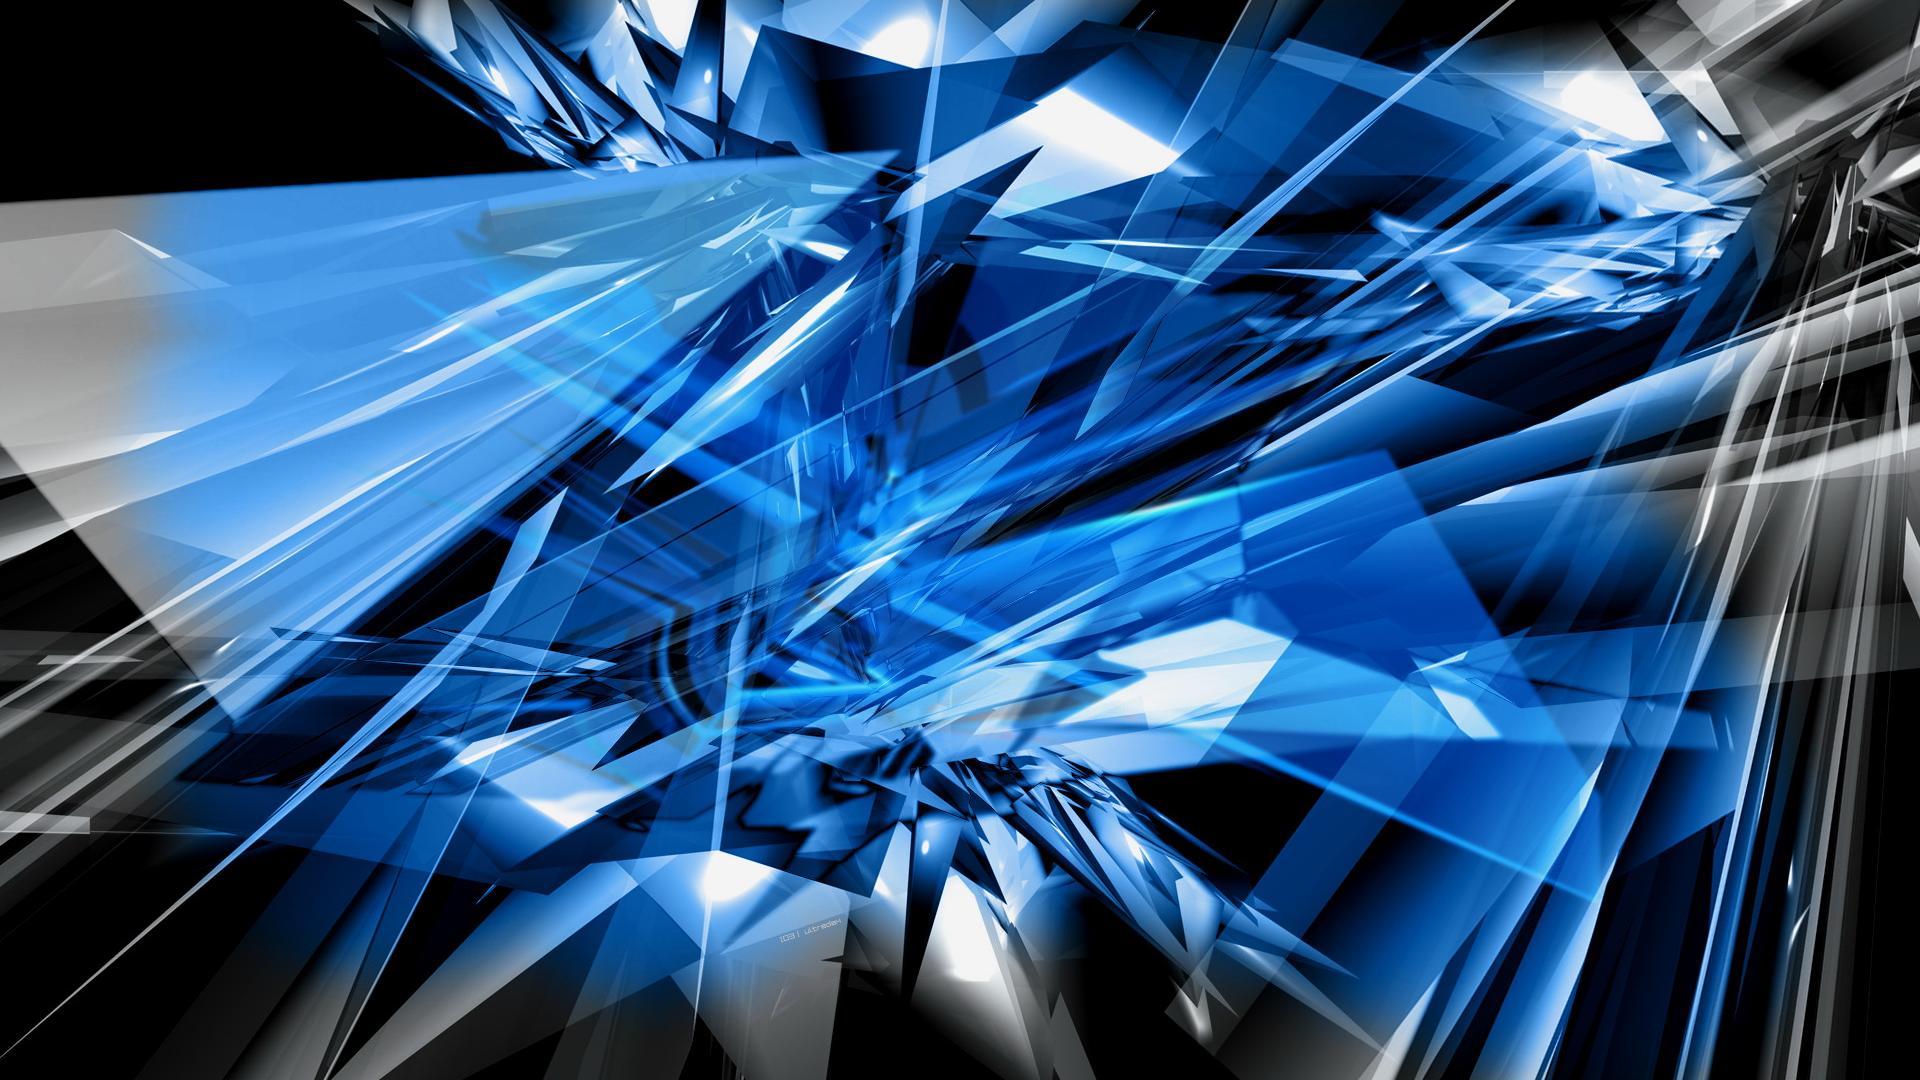 blue abstract wallpaper for pc wallpapersafari